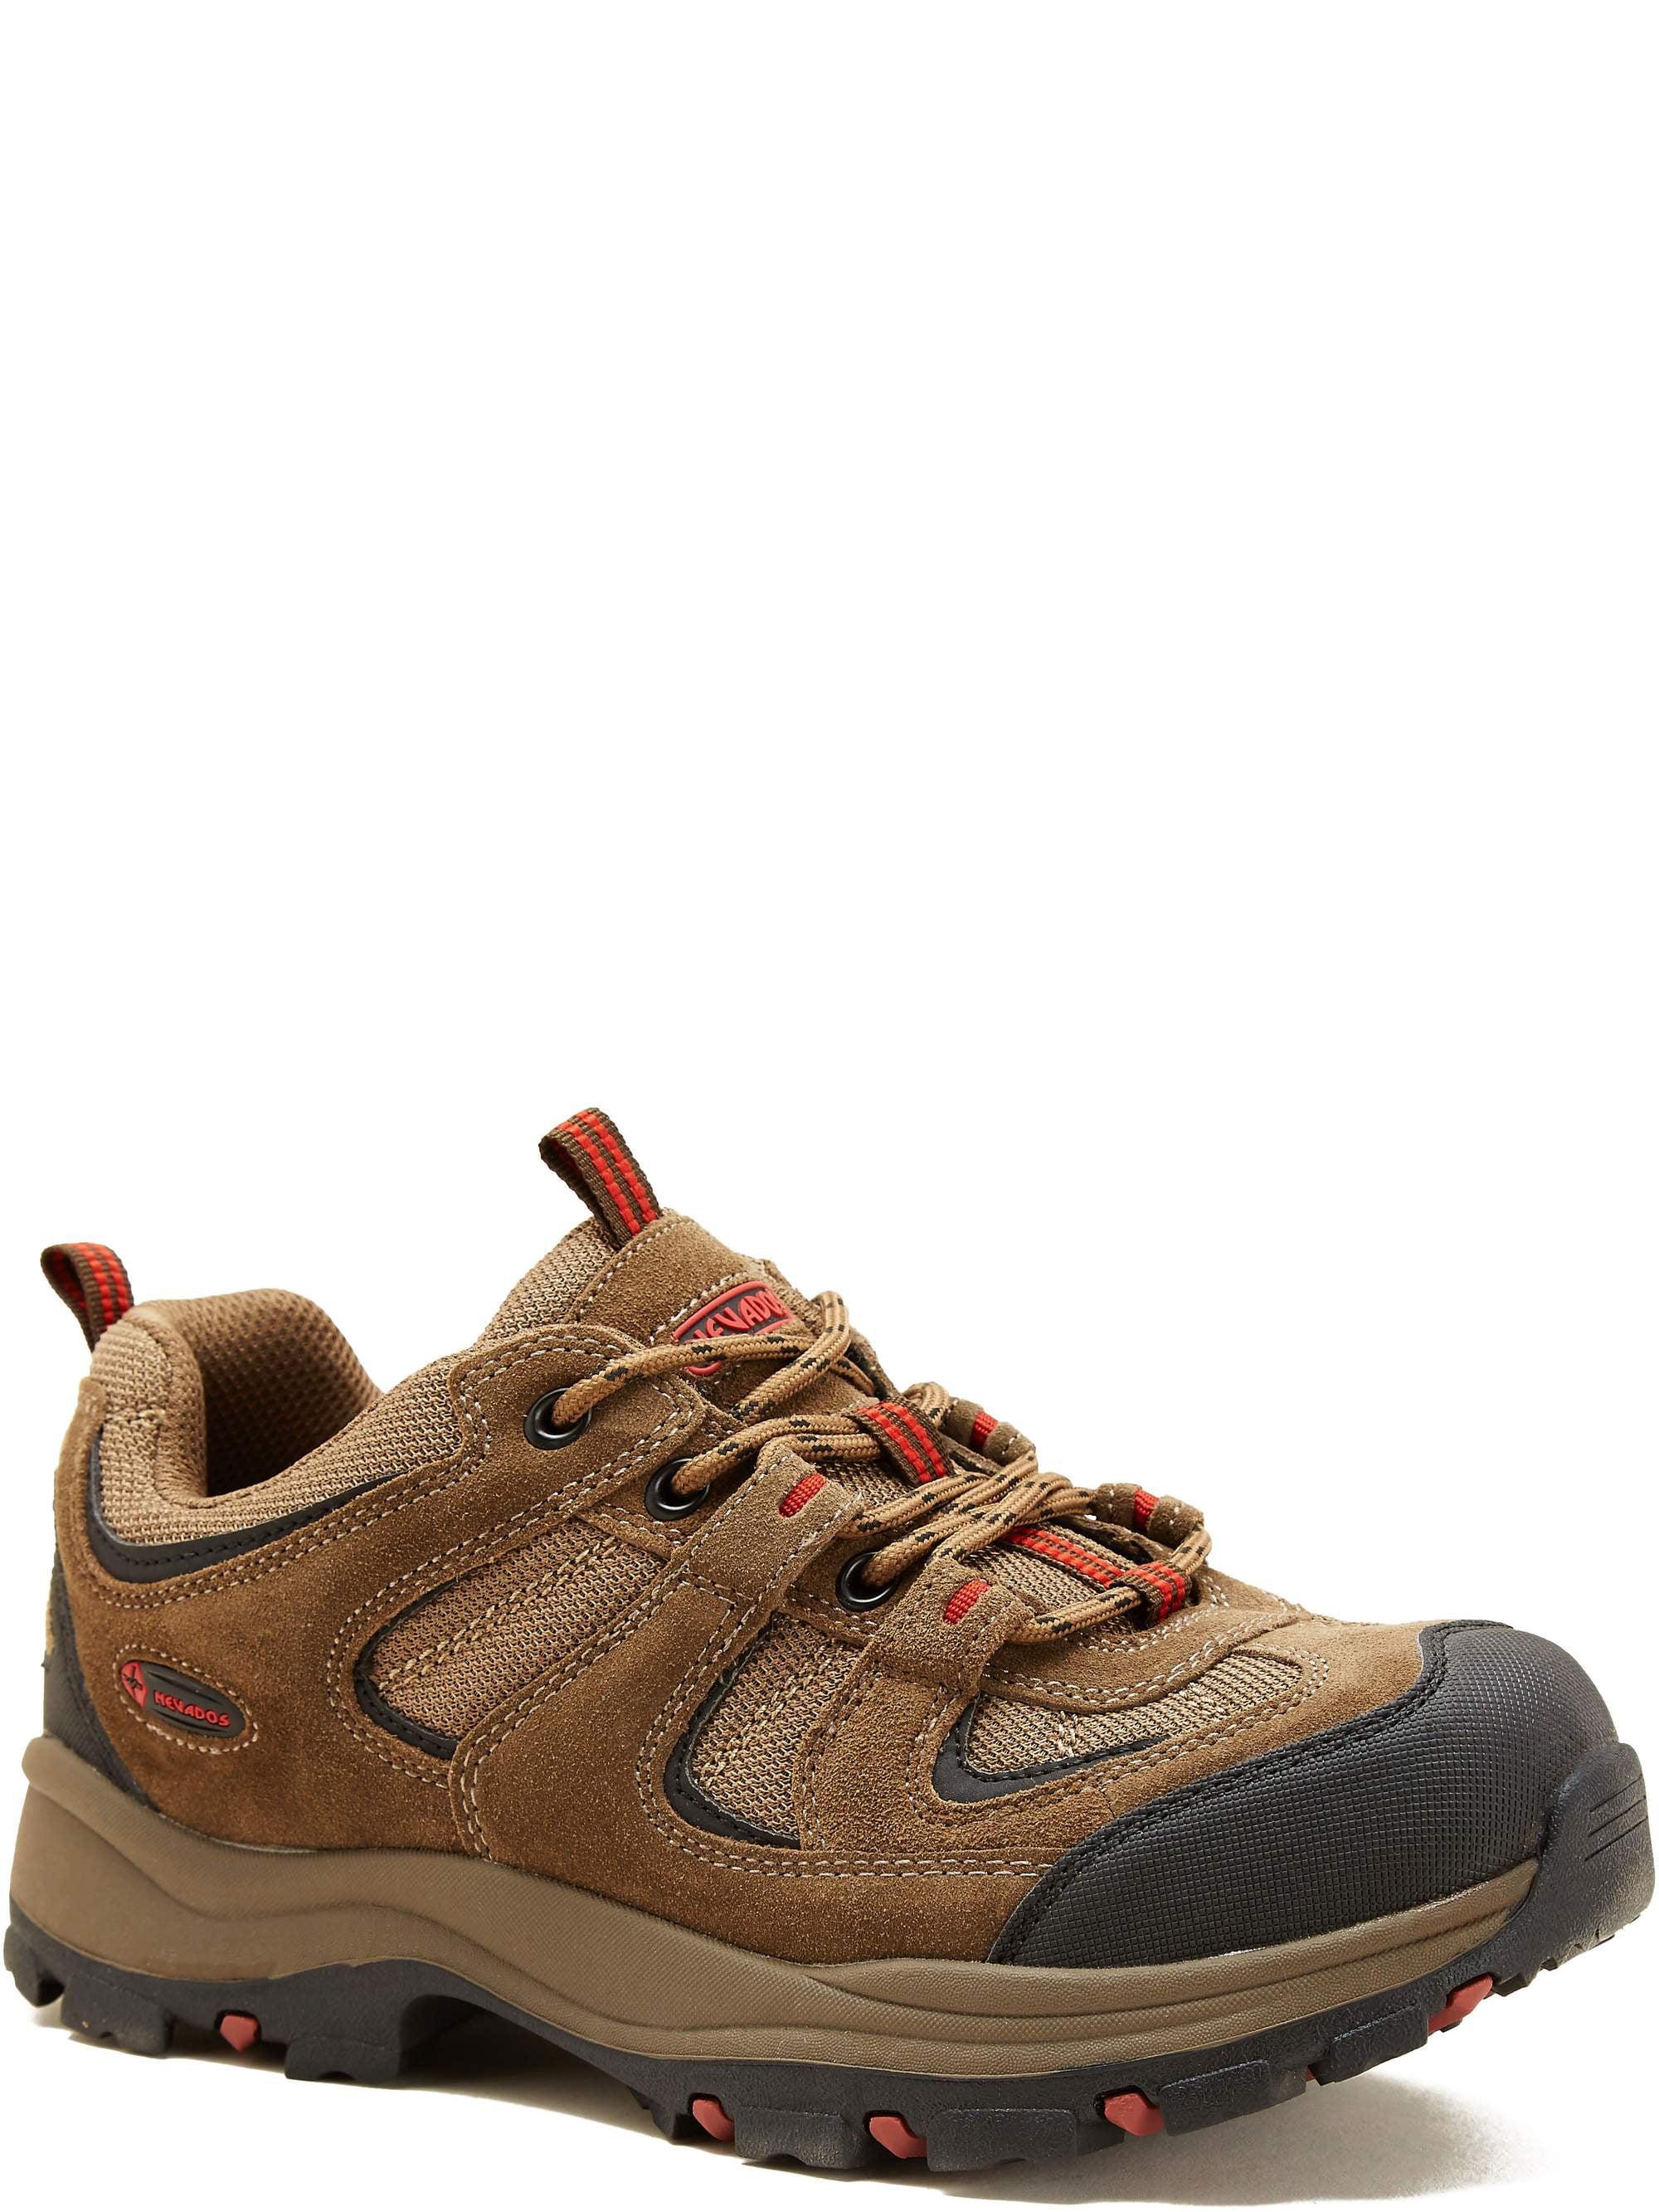 mens low cut hiking shoes